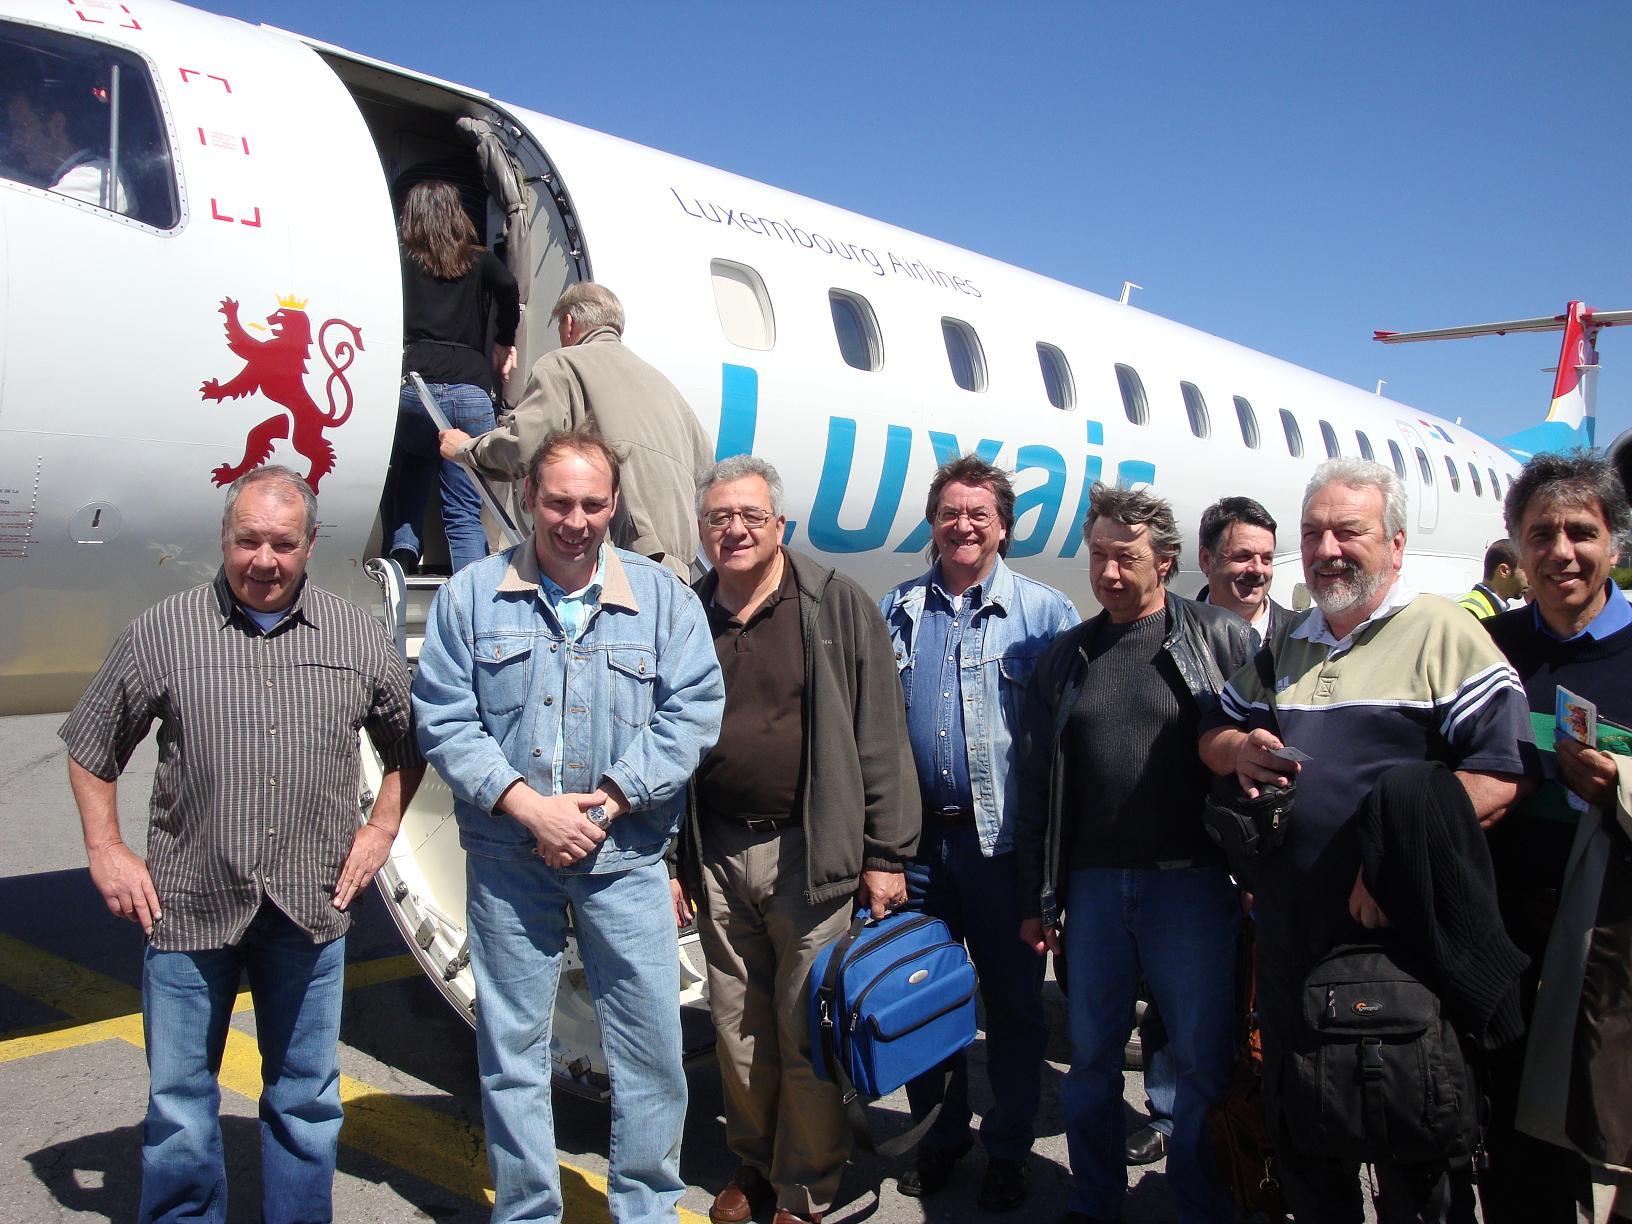 départ avion goteborg 2009